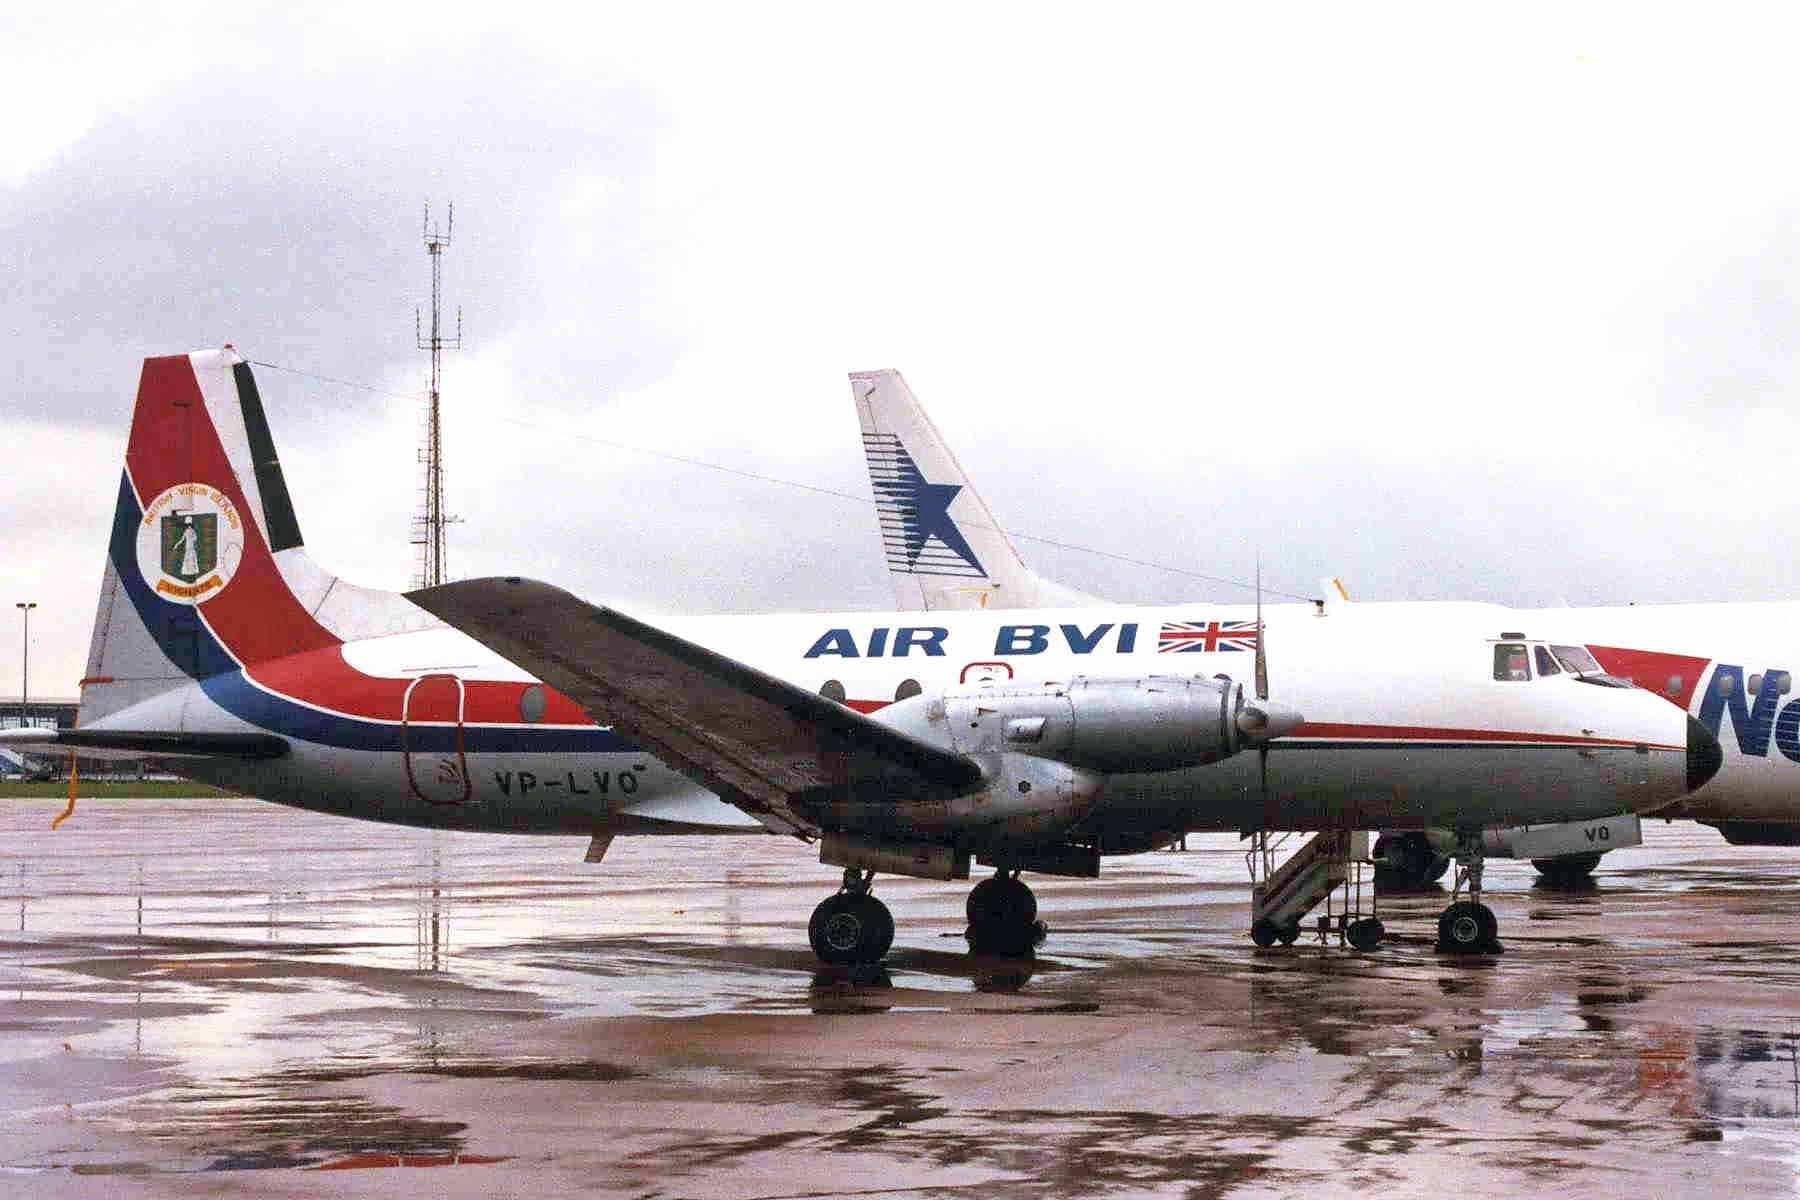 Air BVI Hawker Siddeley HS 748 with registration VP-LVO.